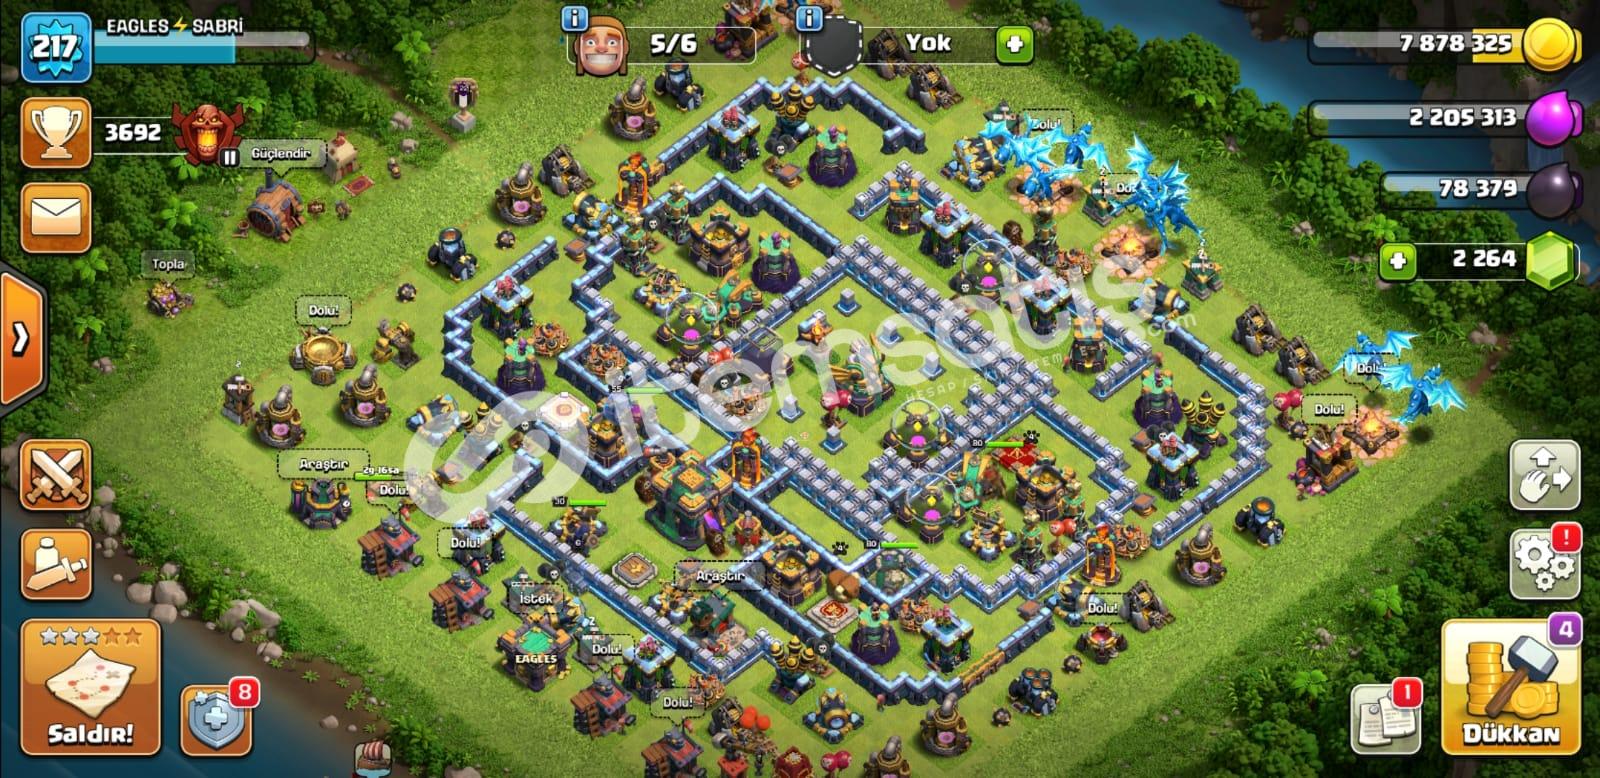 bb14 217 seviye tüm herolar full ve full köy